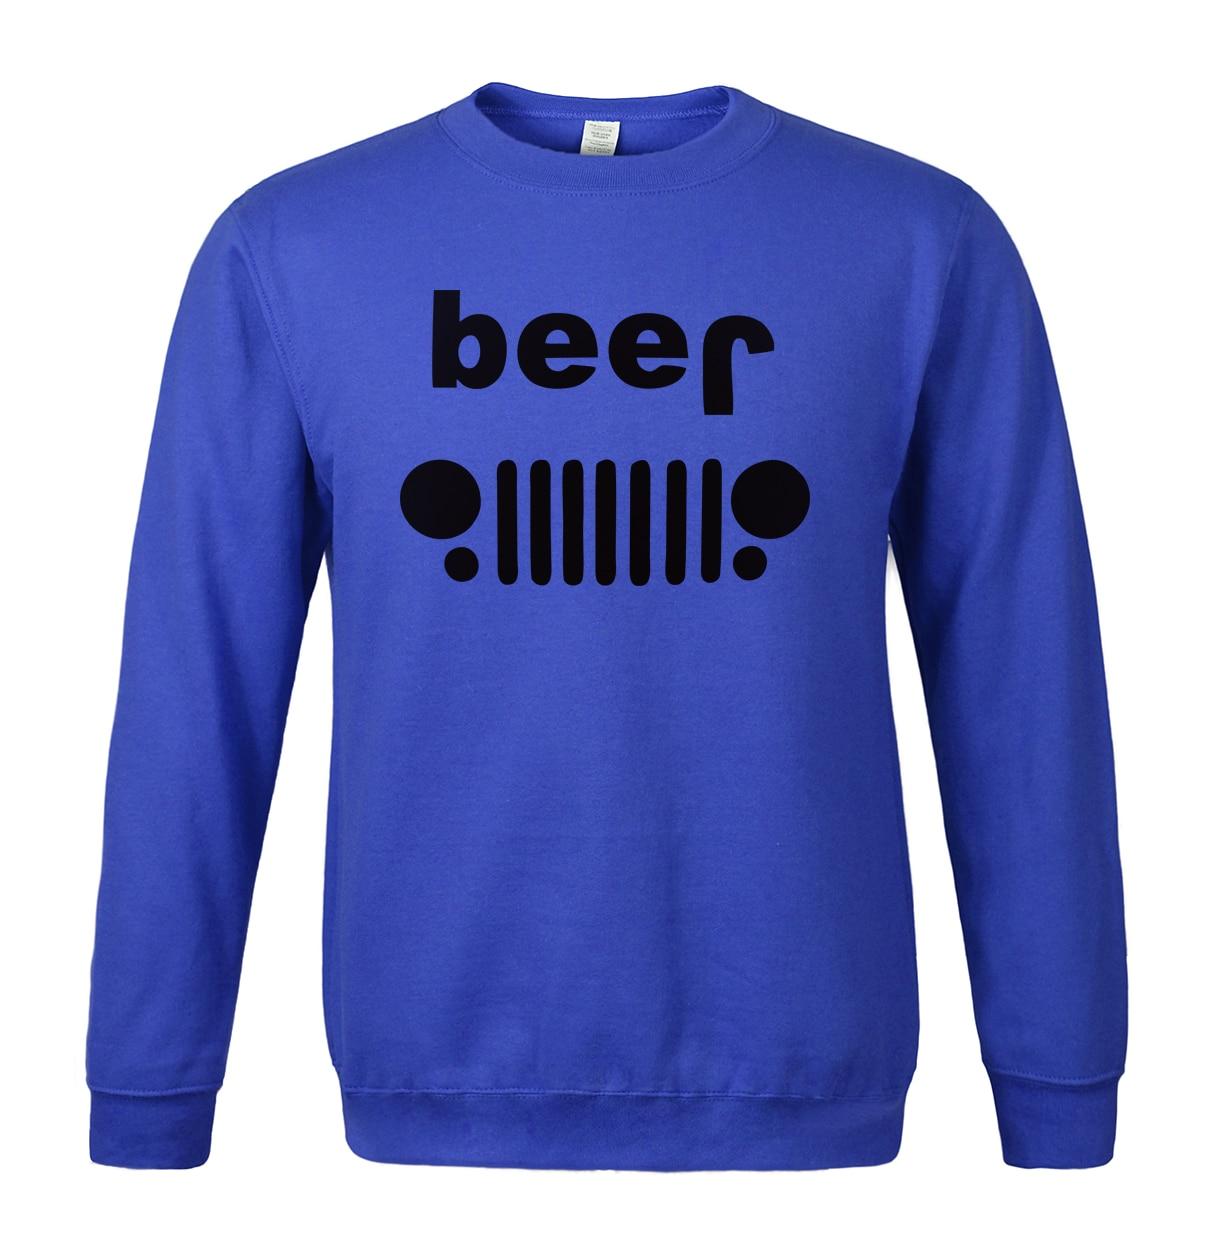 Sweatshirt 2018 spring winter printed BEER fashion hoodies cool car-styling mens sportswear brand-clothing sweashirts men